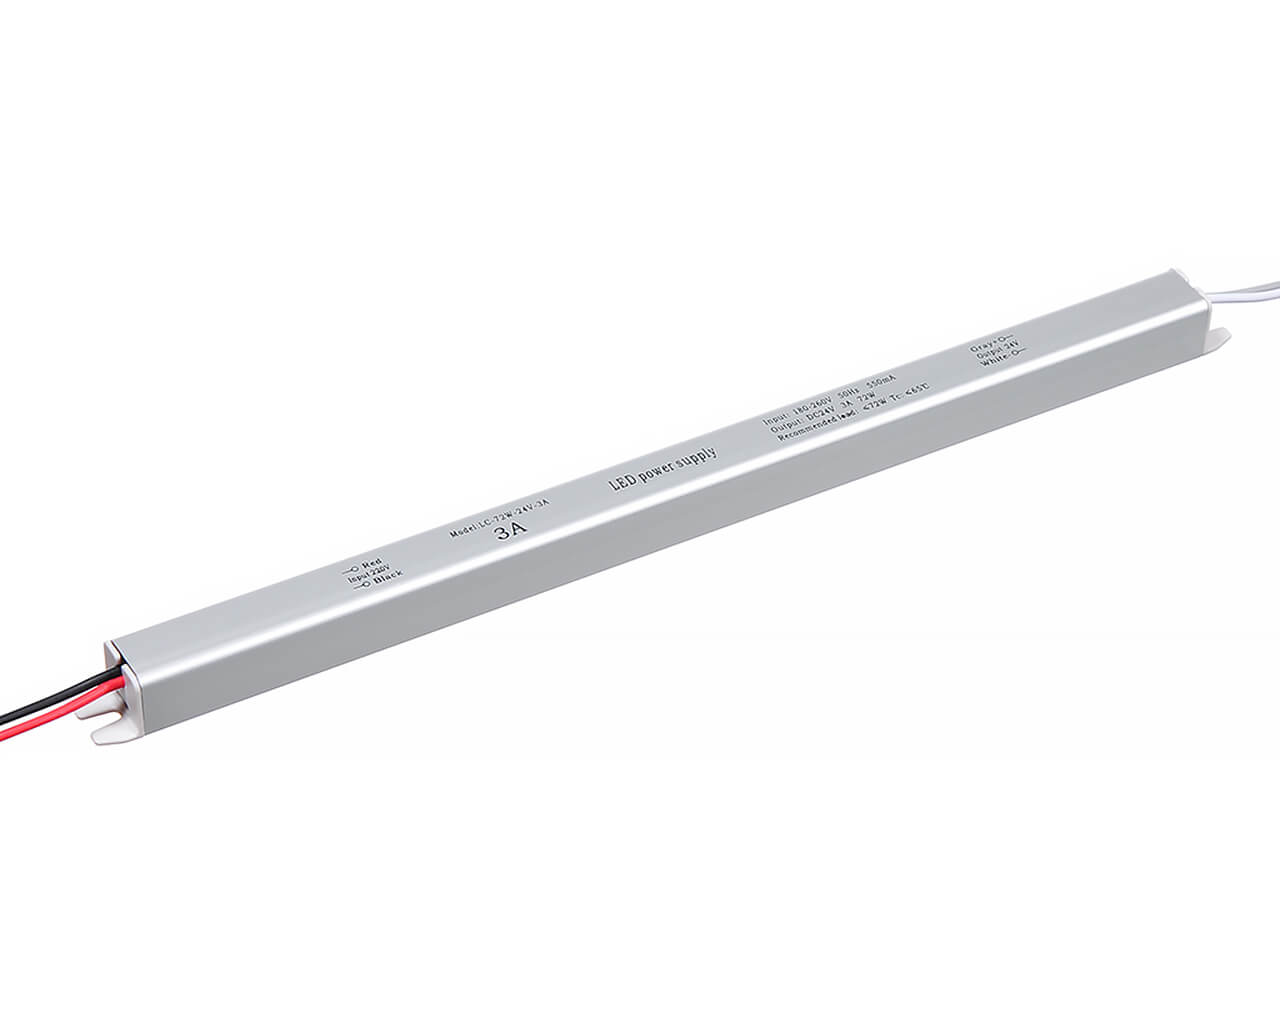 Блок питания LC-K72W-24V 3А (карандаш 372*18*18)